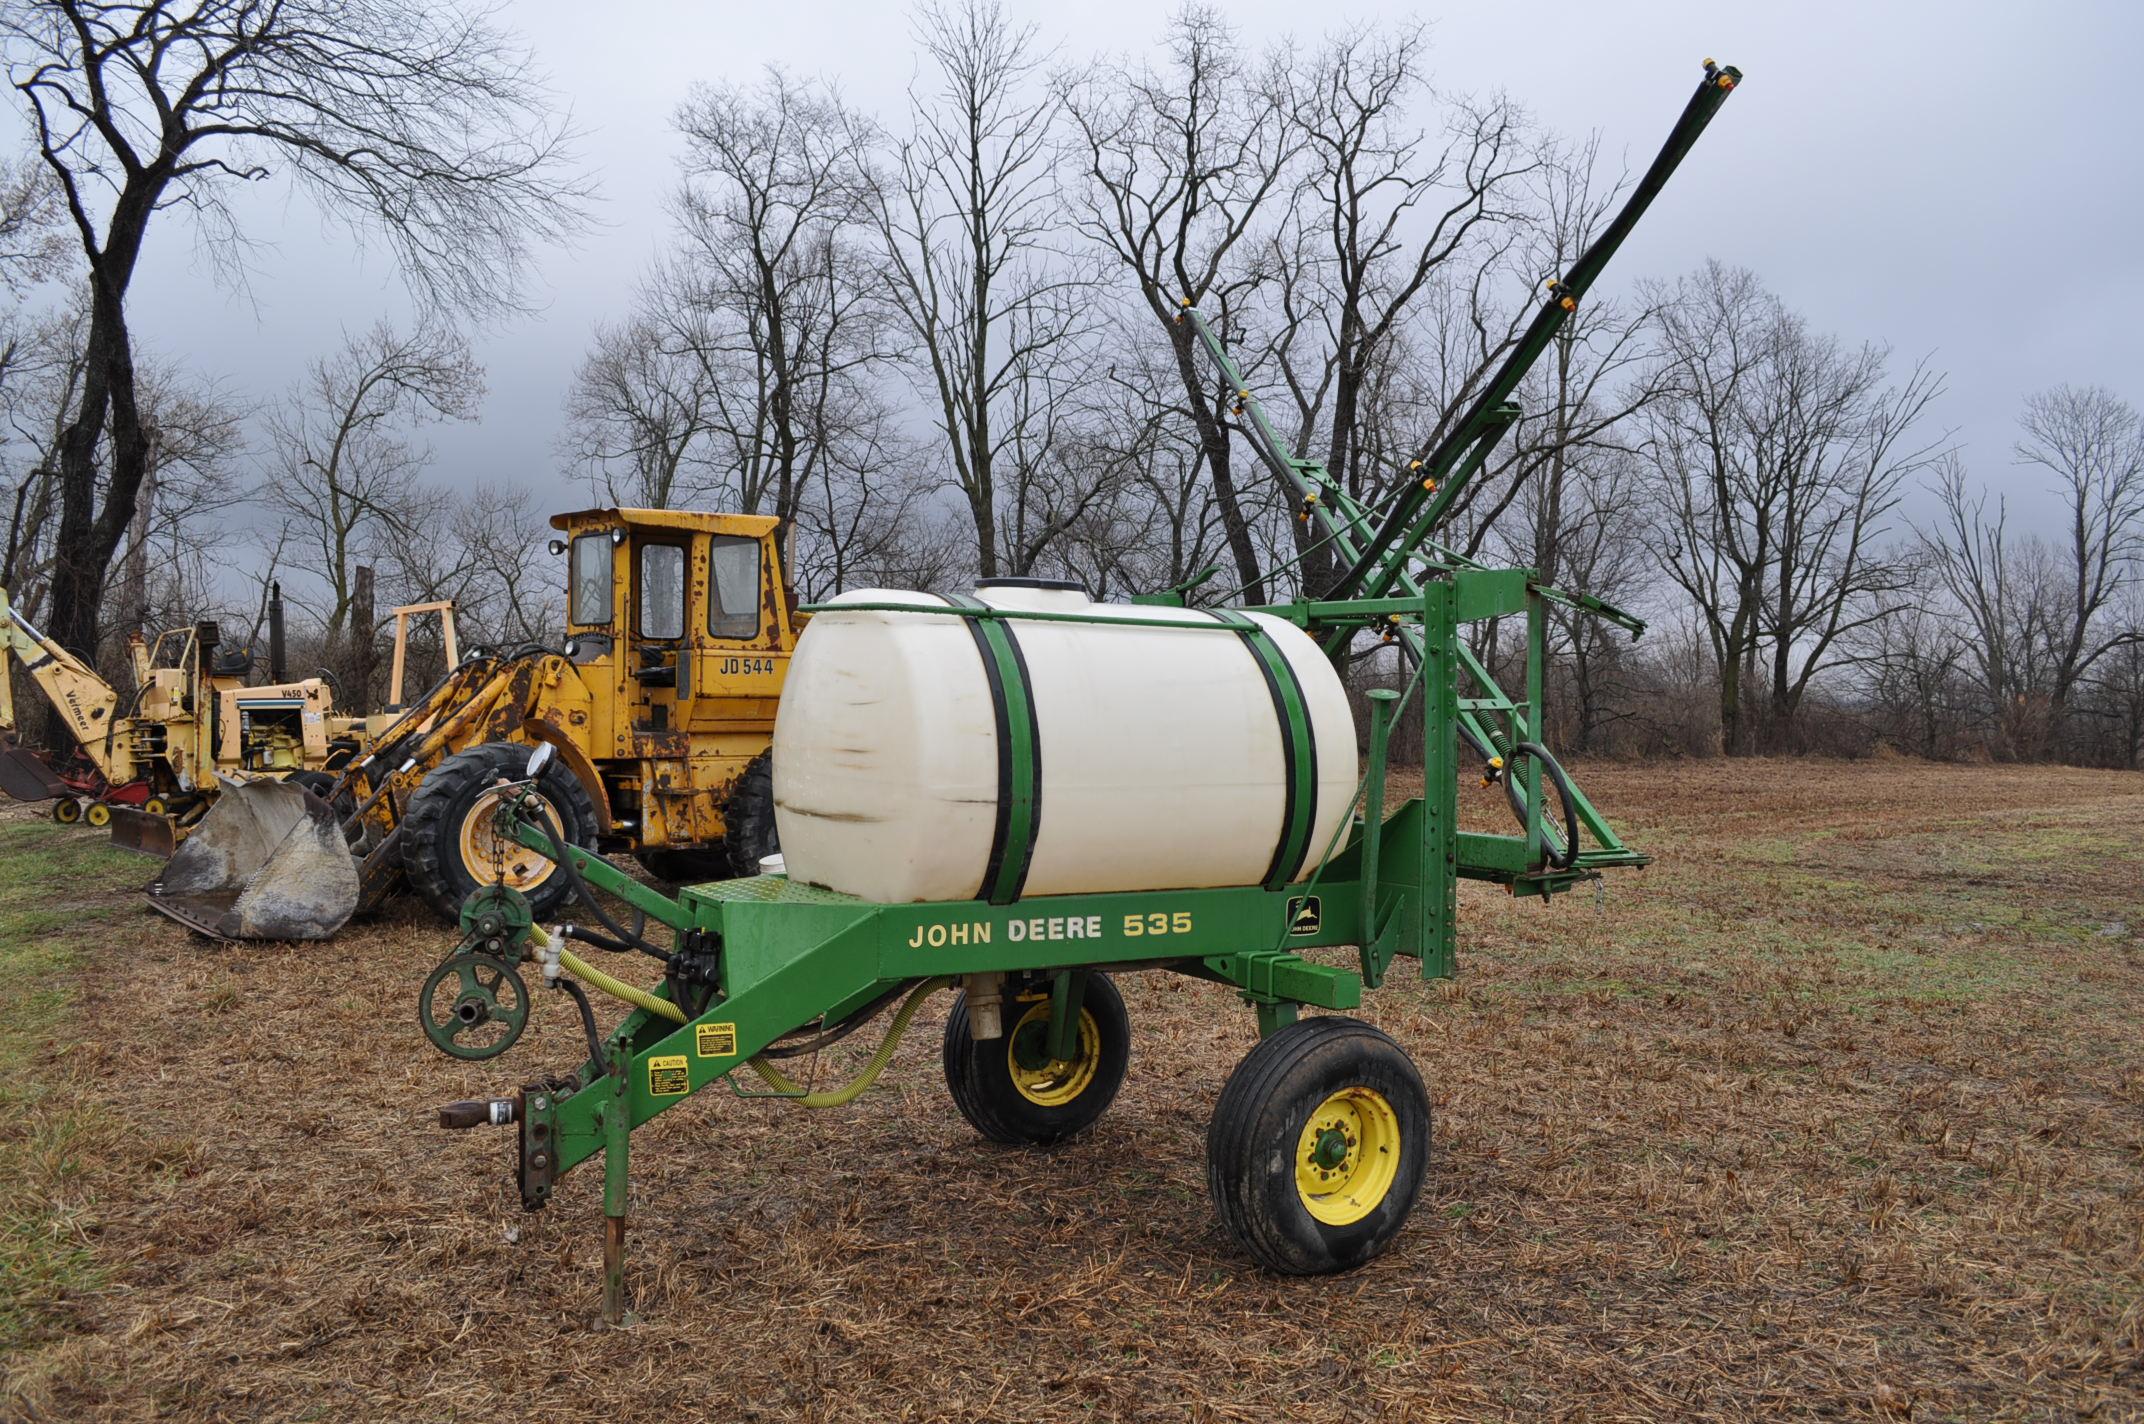 John Deere 535 pull-type sprayer, 350 gallon tank, 30' boom